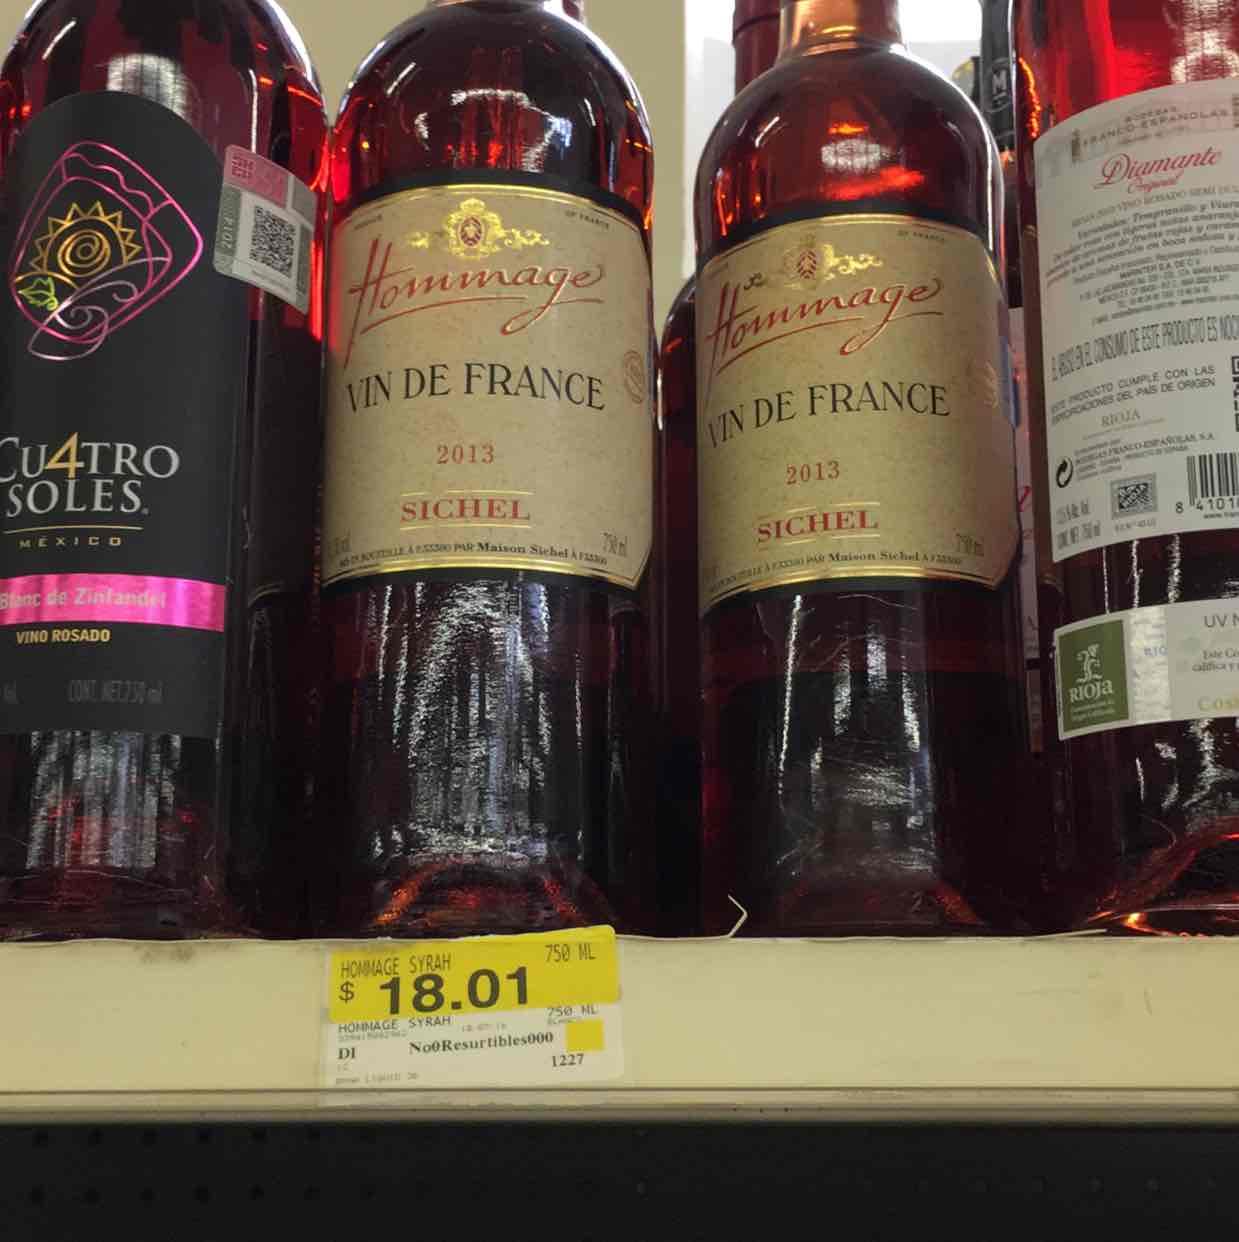 Walmart MTY: vino rosado hommage a $18.01